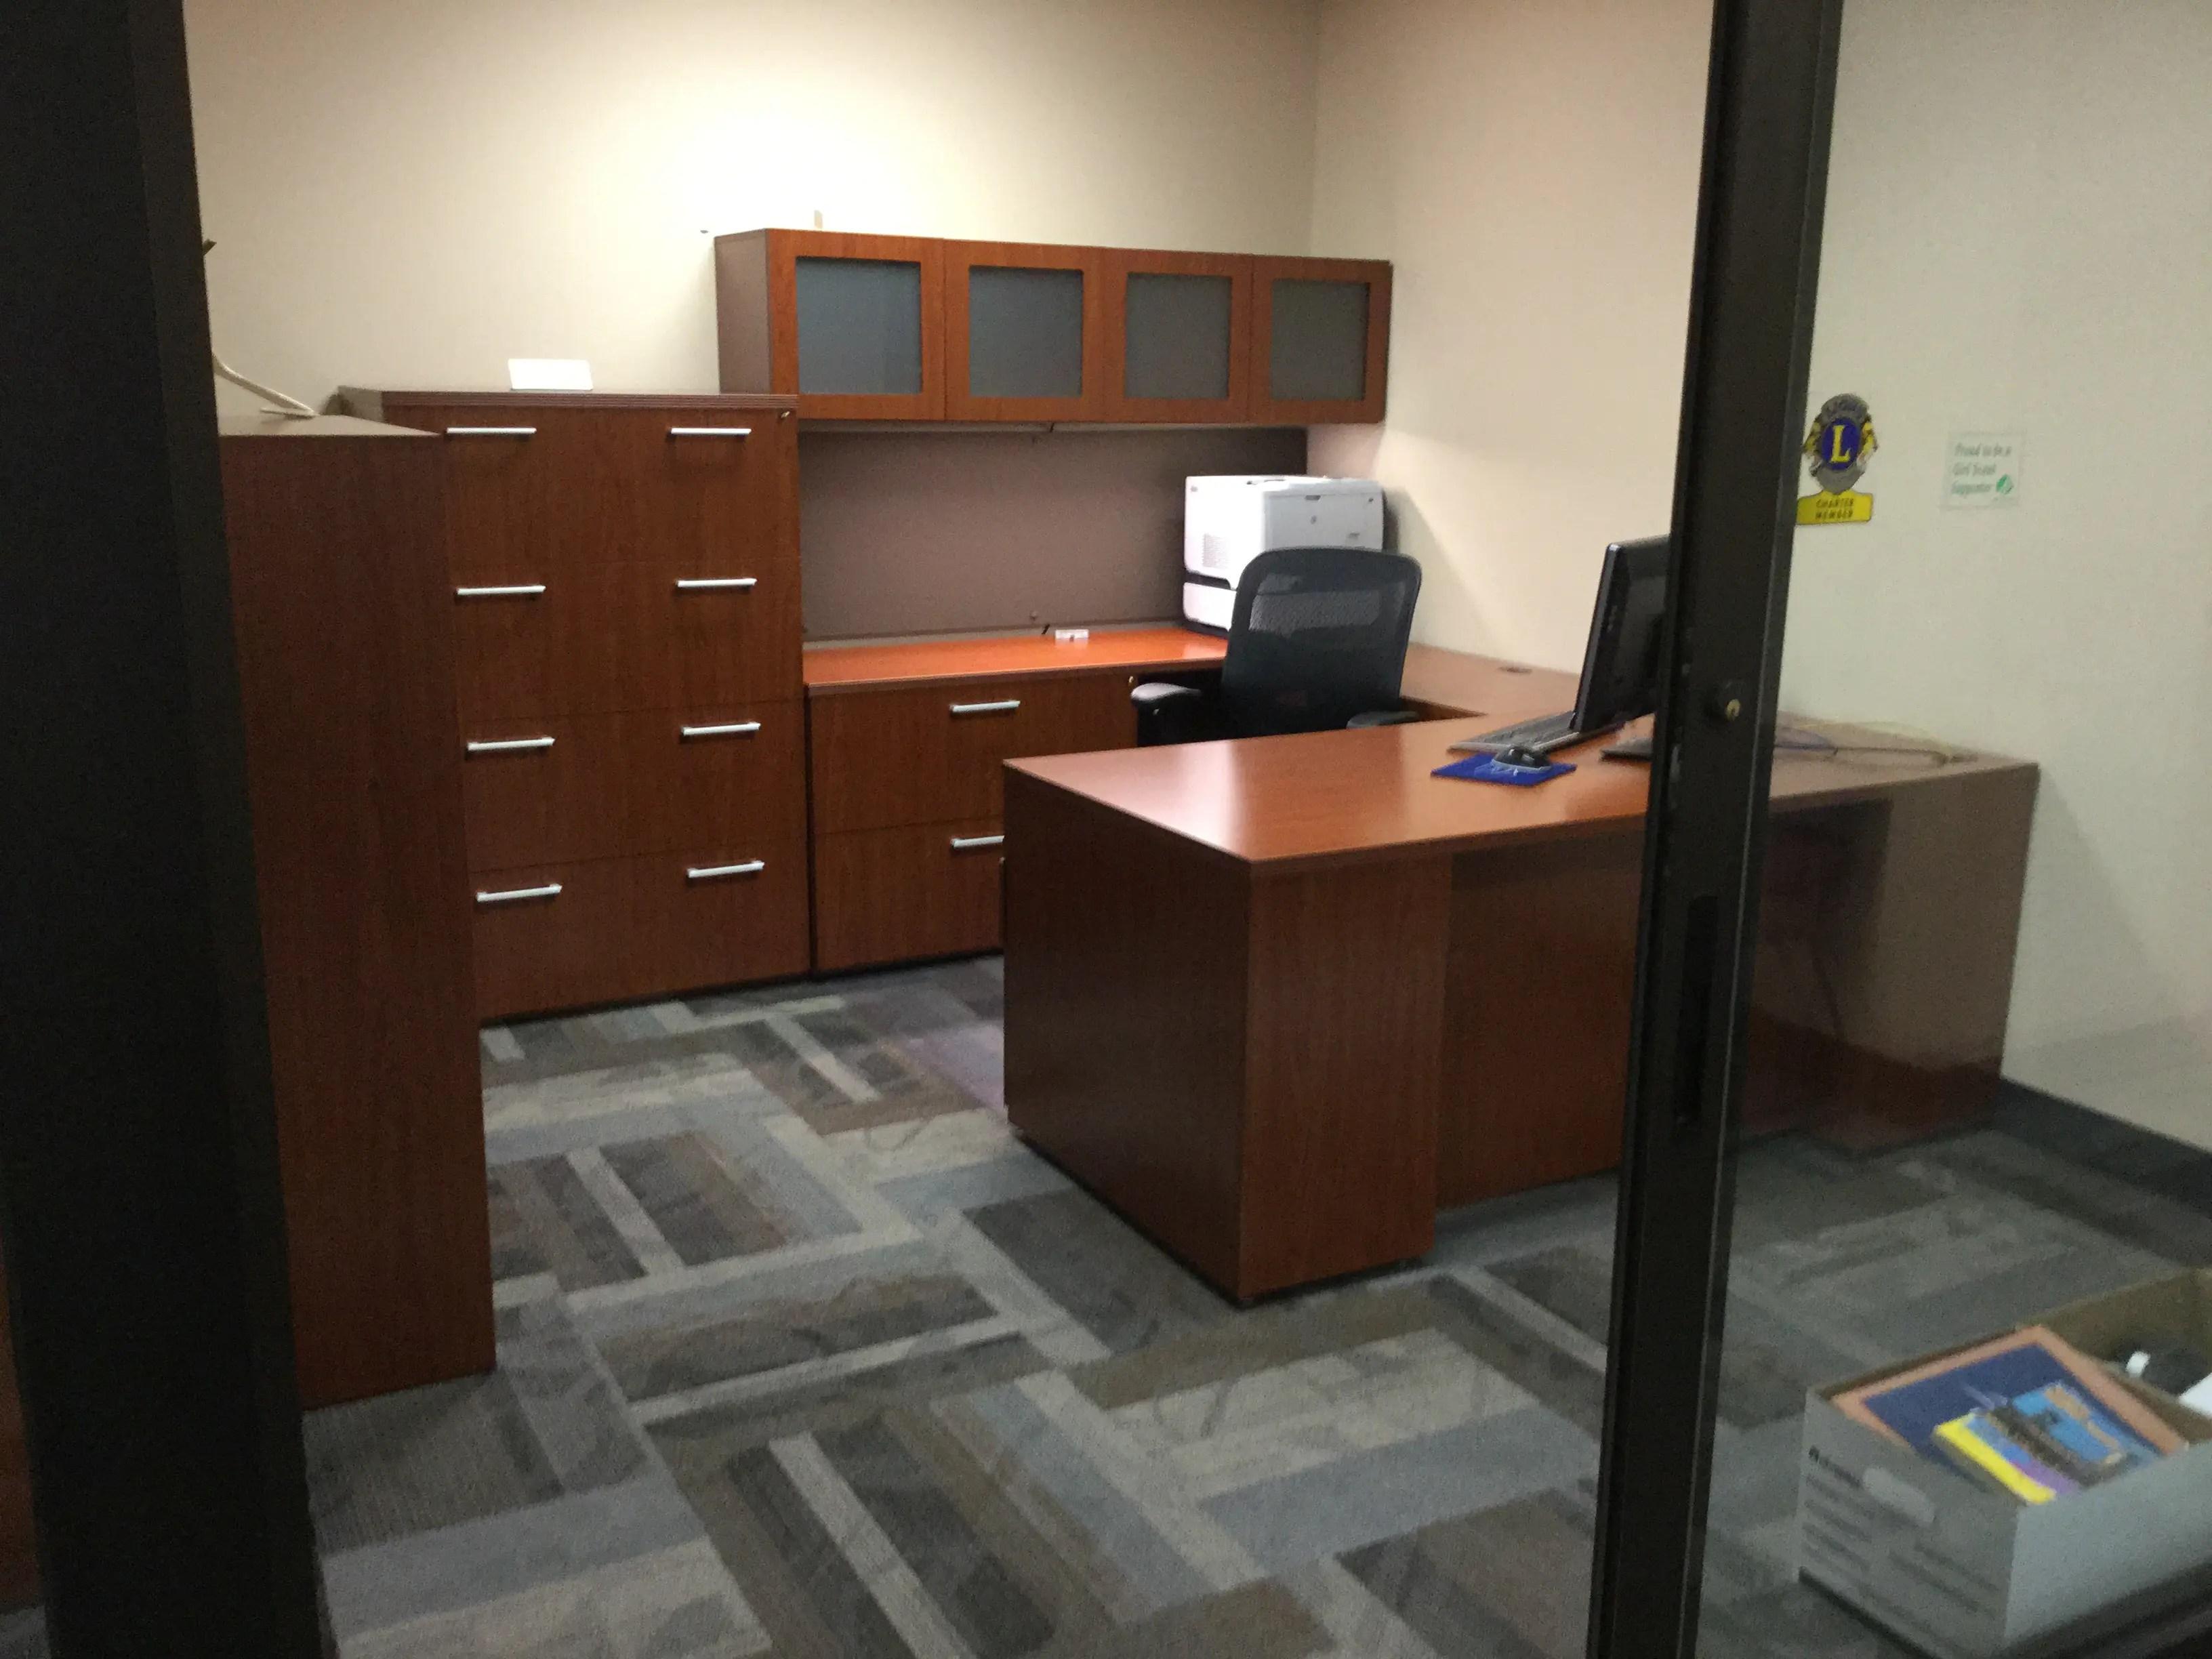 Custom office furniture design Wood Office Furniture Stoneline Designs Custom Office Design Corporate Office Design Services